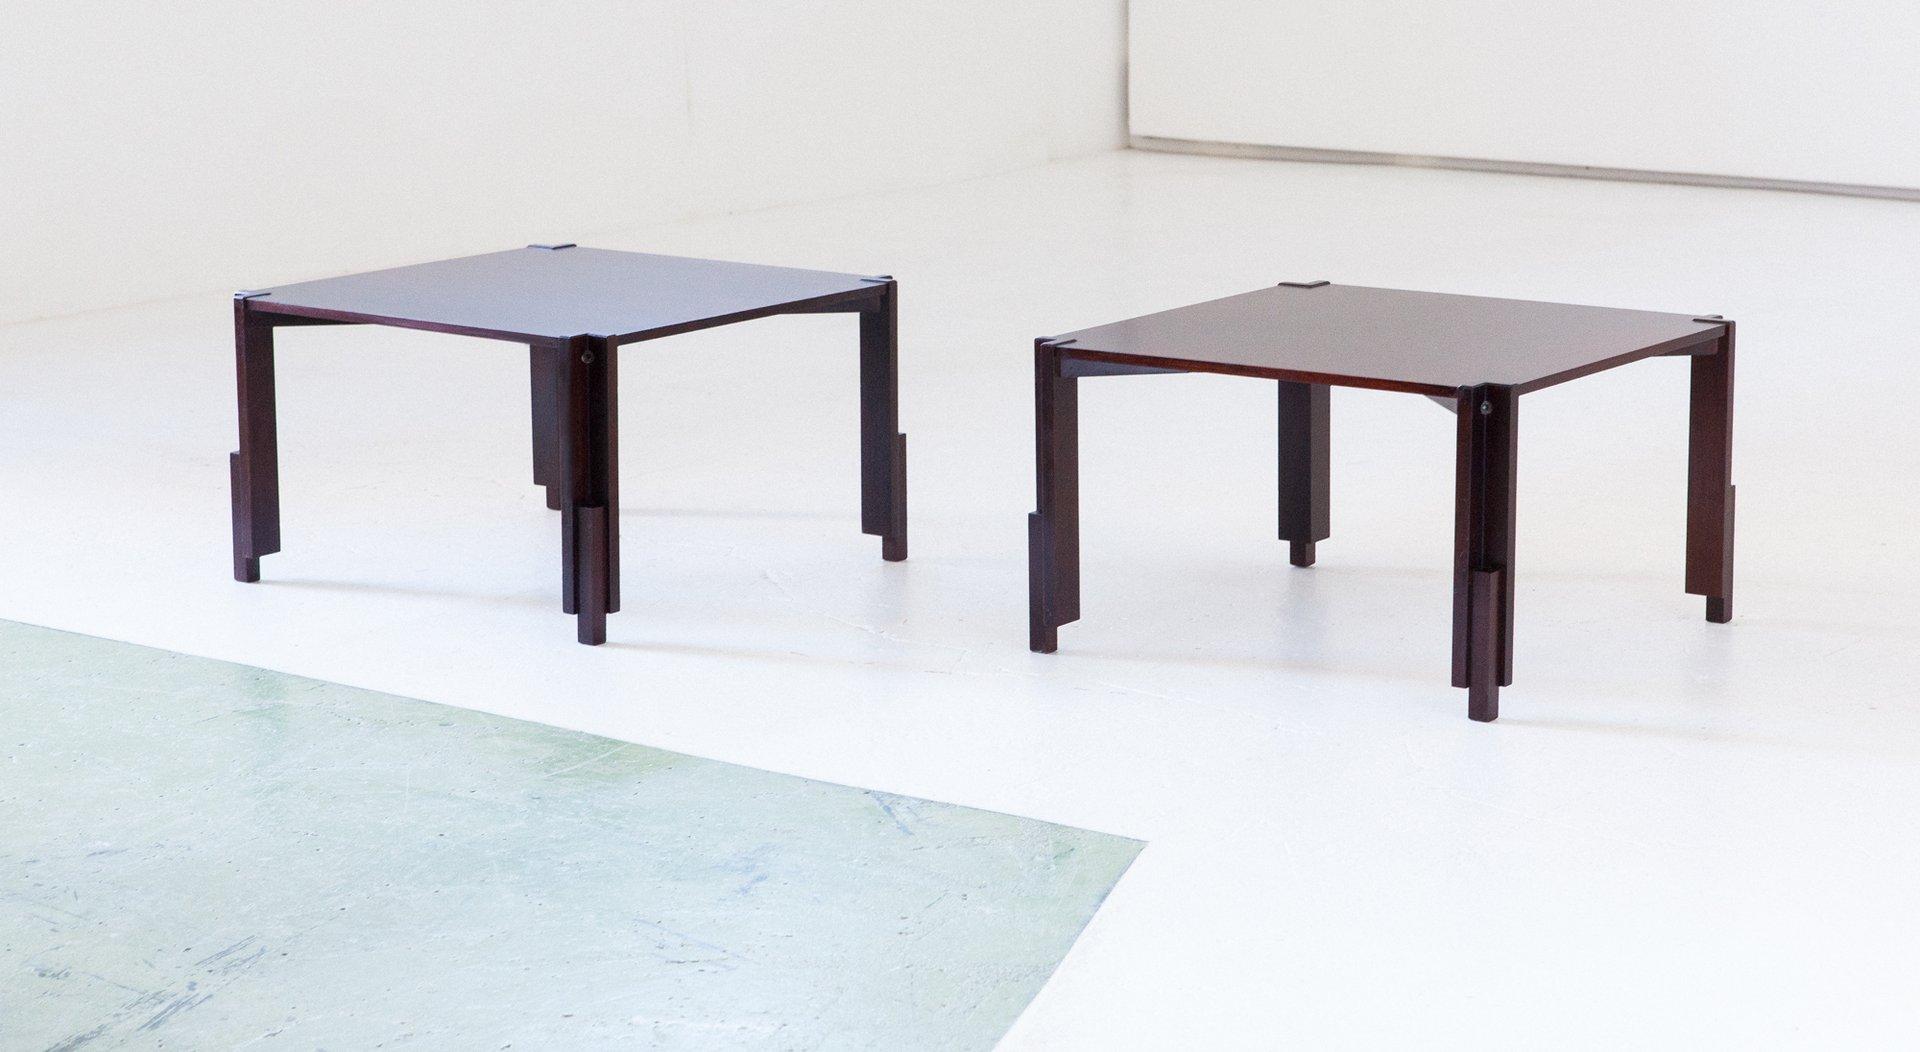 italienische palisander couchtische 1960er 2er set bei. Black Bedroom Furniture Sets. Home Design Ideas